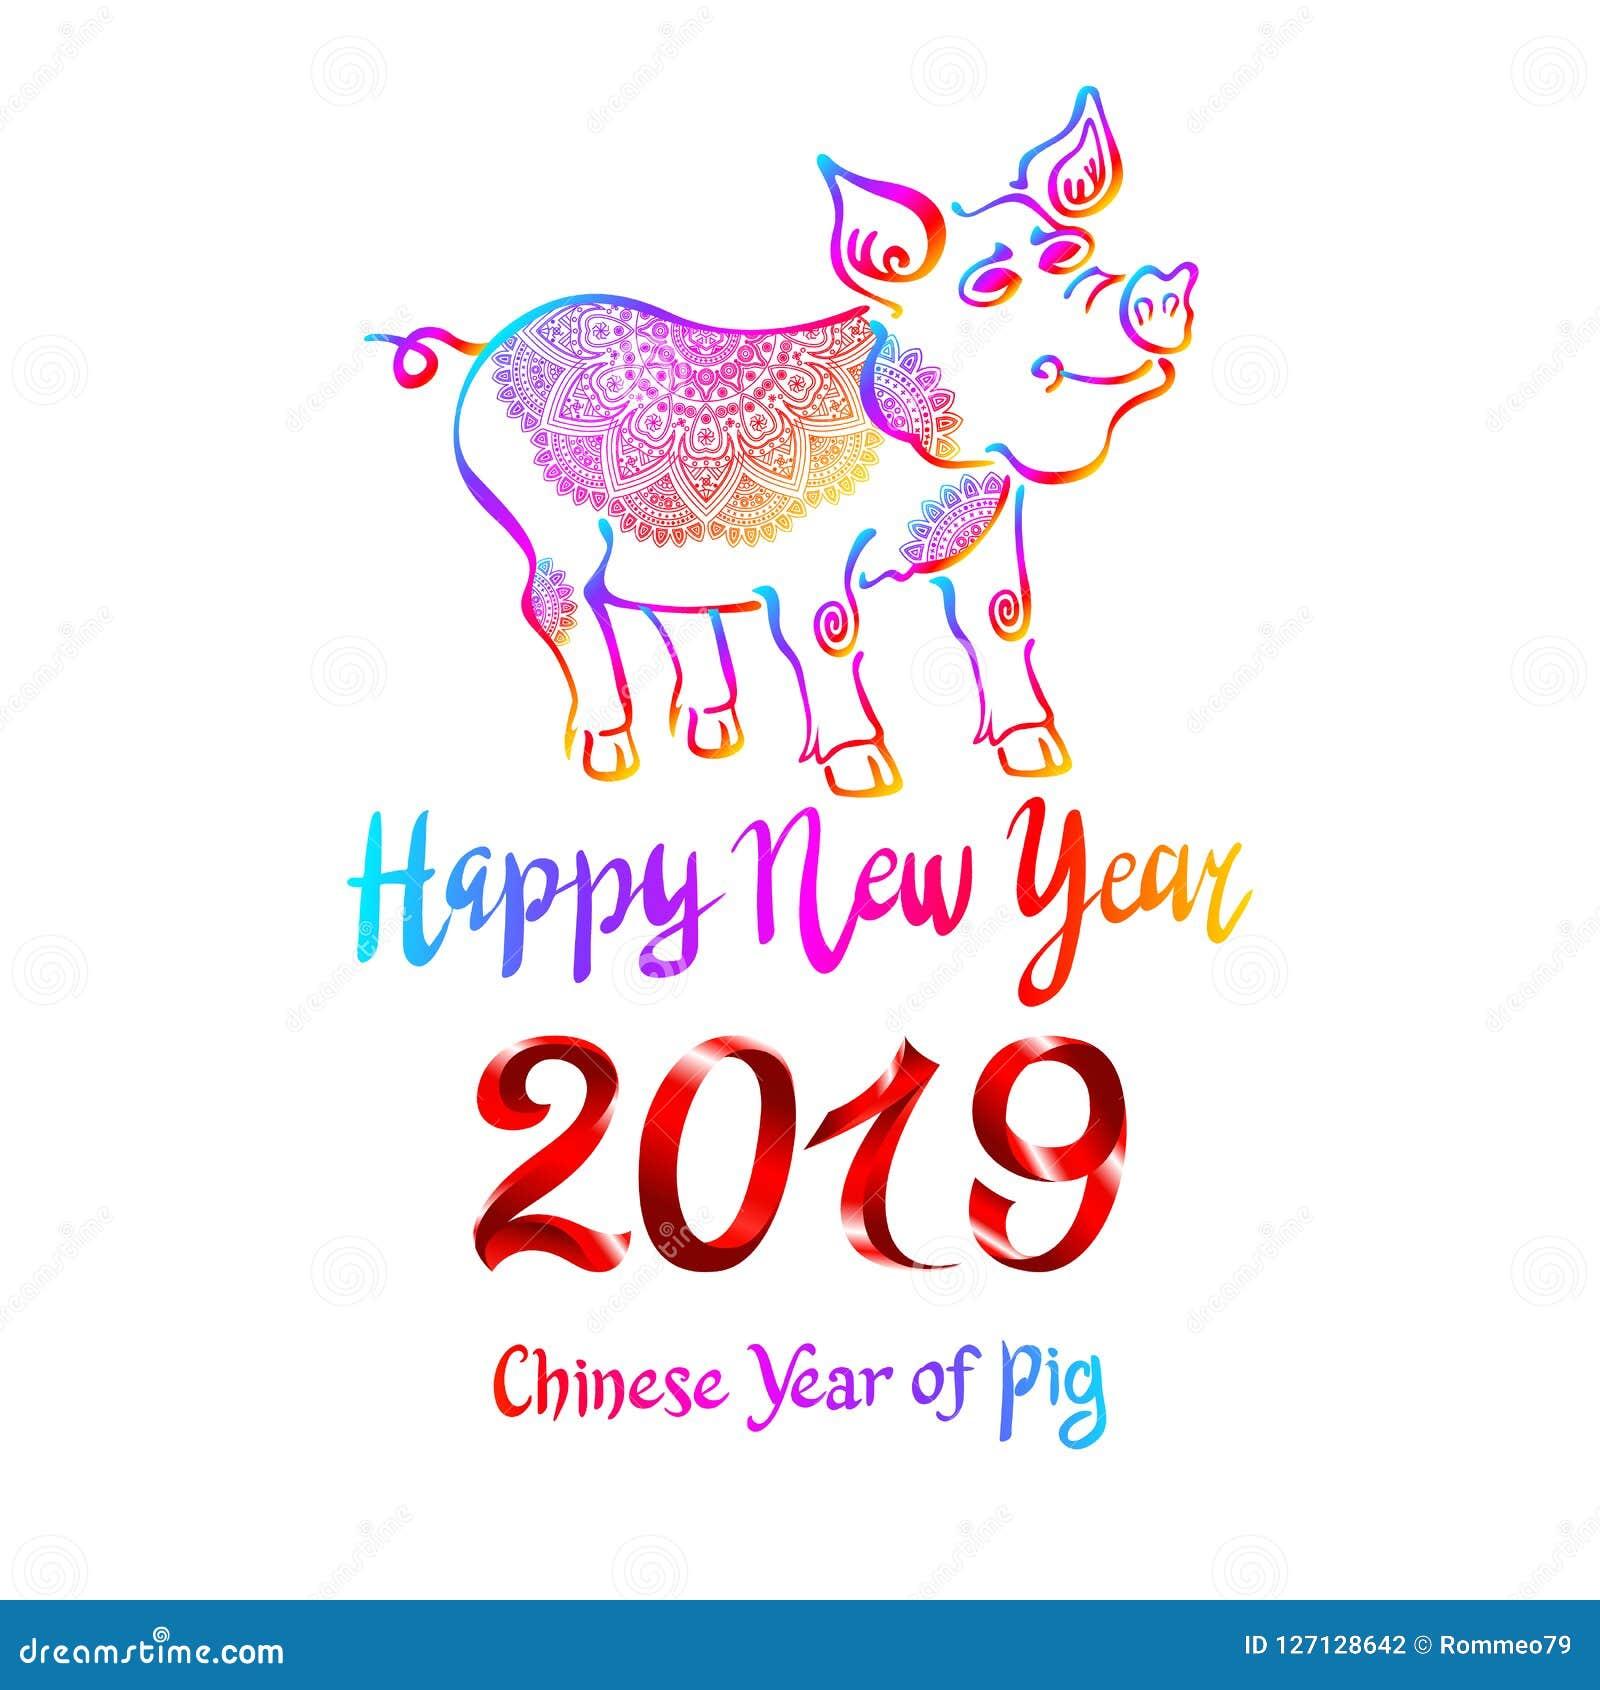 2019 Zodiac Rainbow Pig Happy New Year 2019 Vector Chinese Calendar